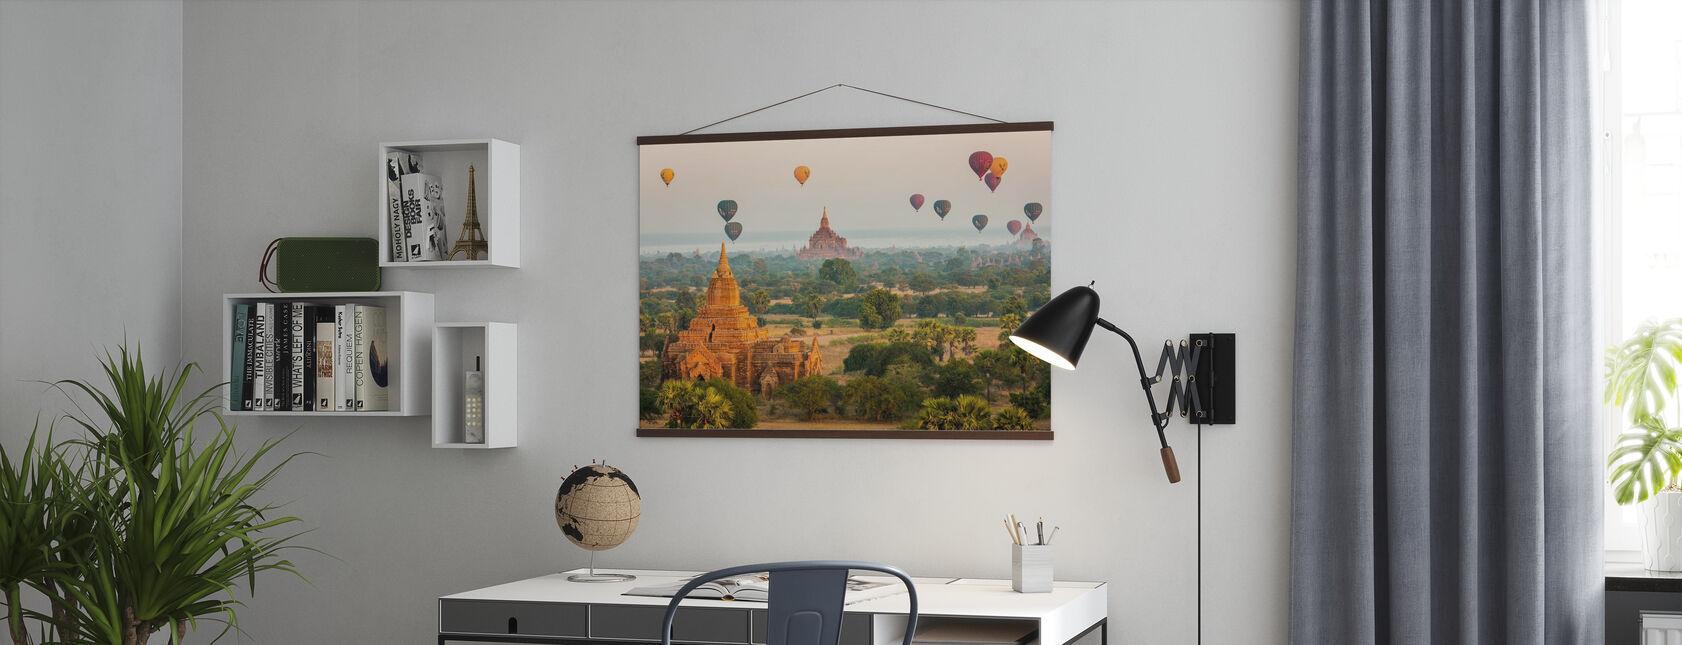 Bagan Baloons - Poster - Office